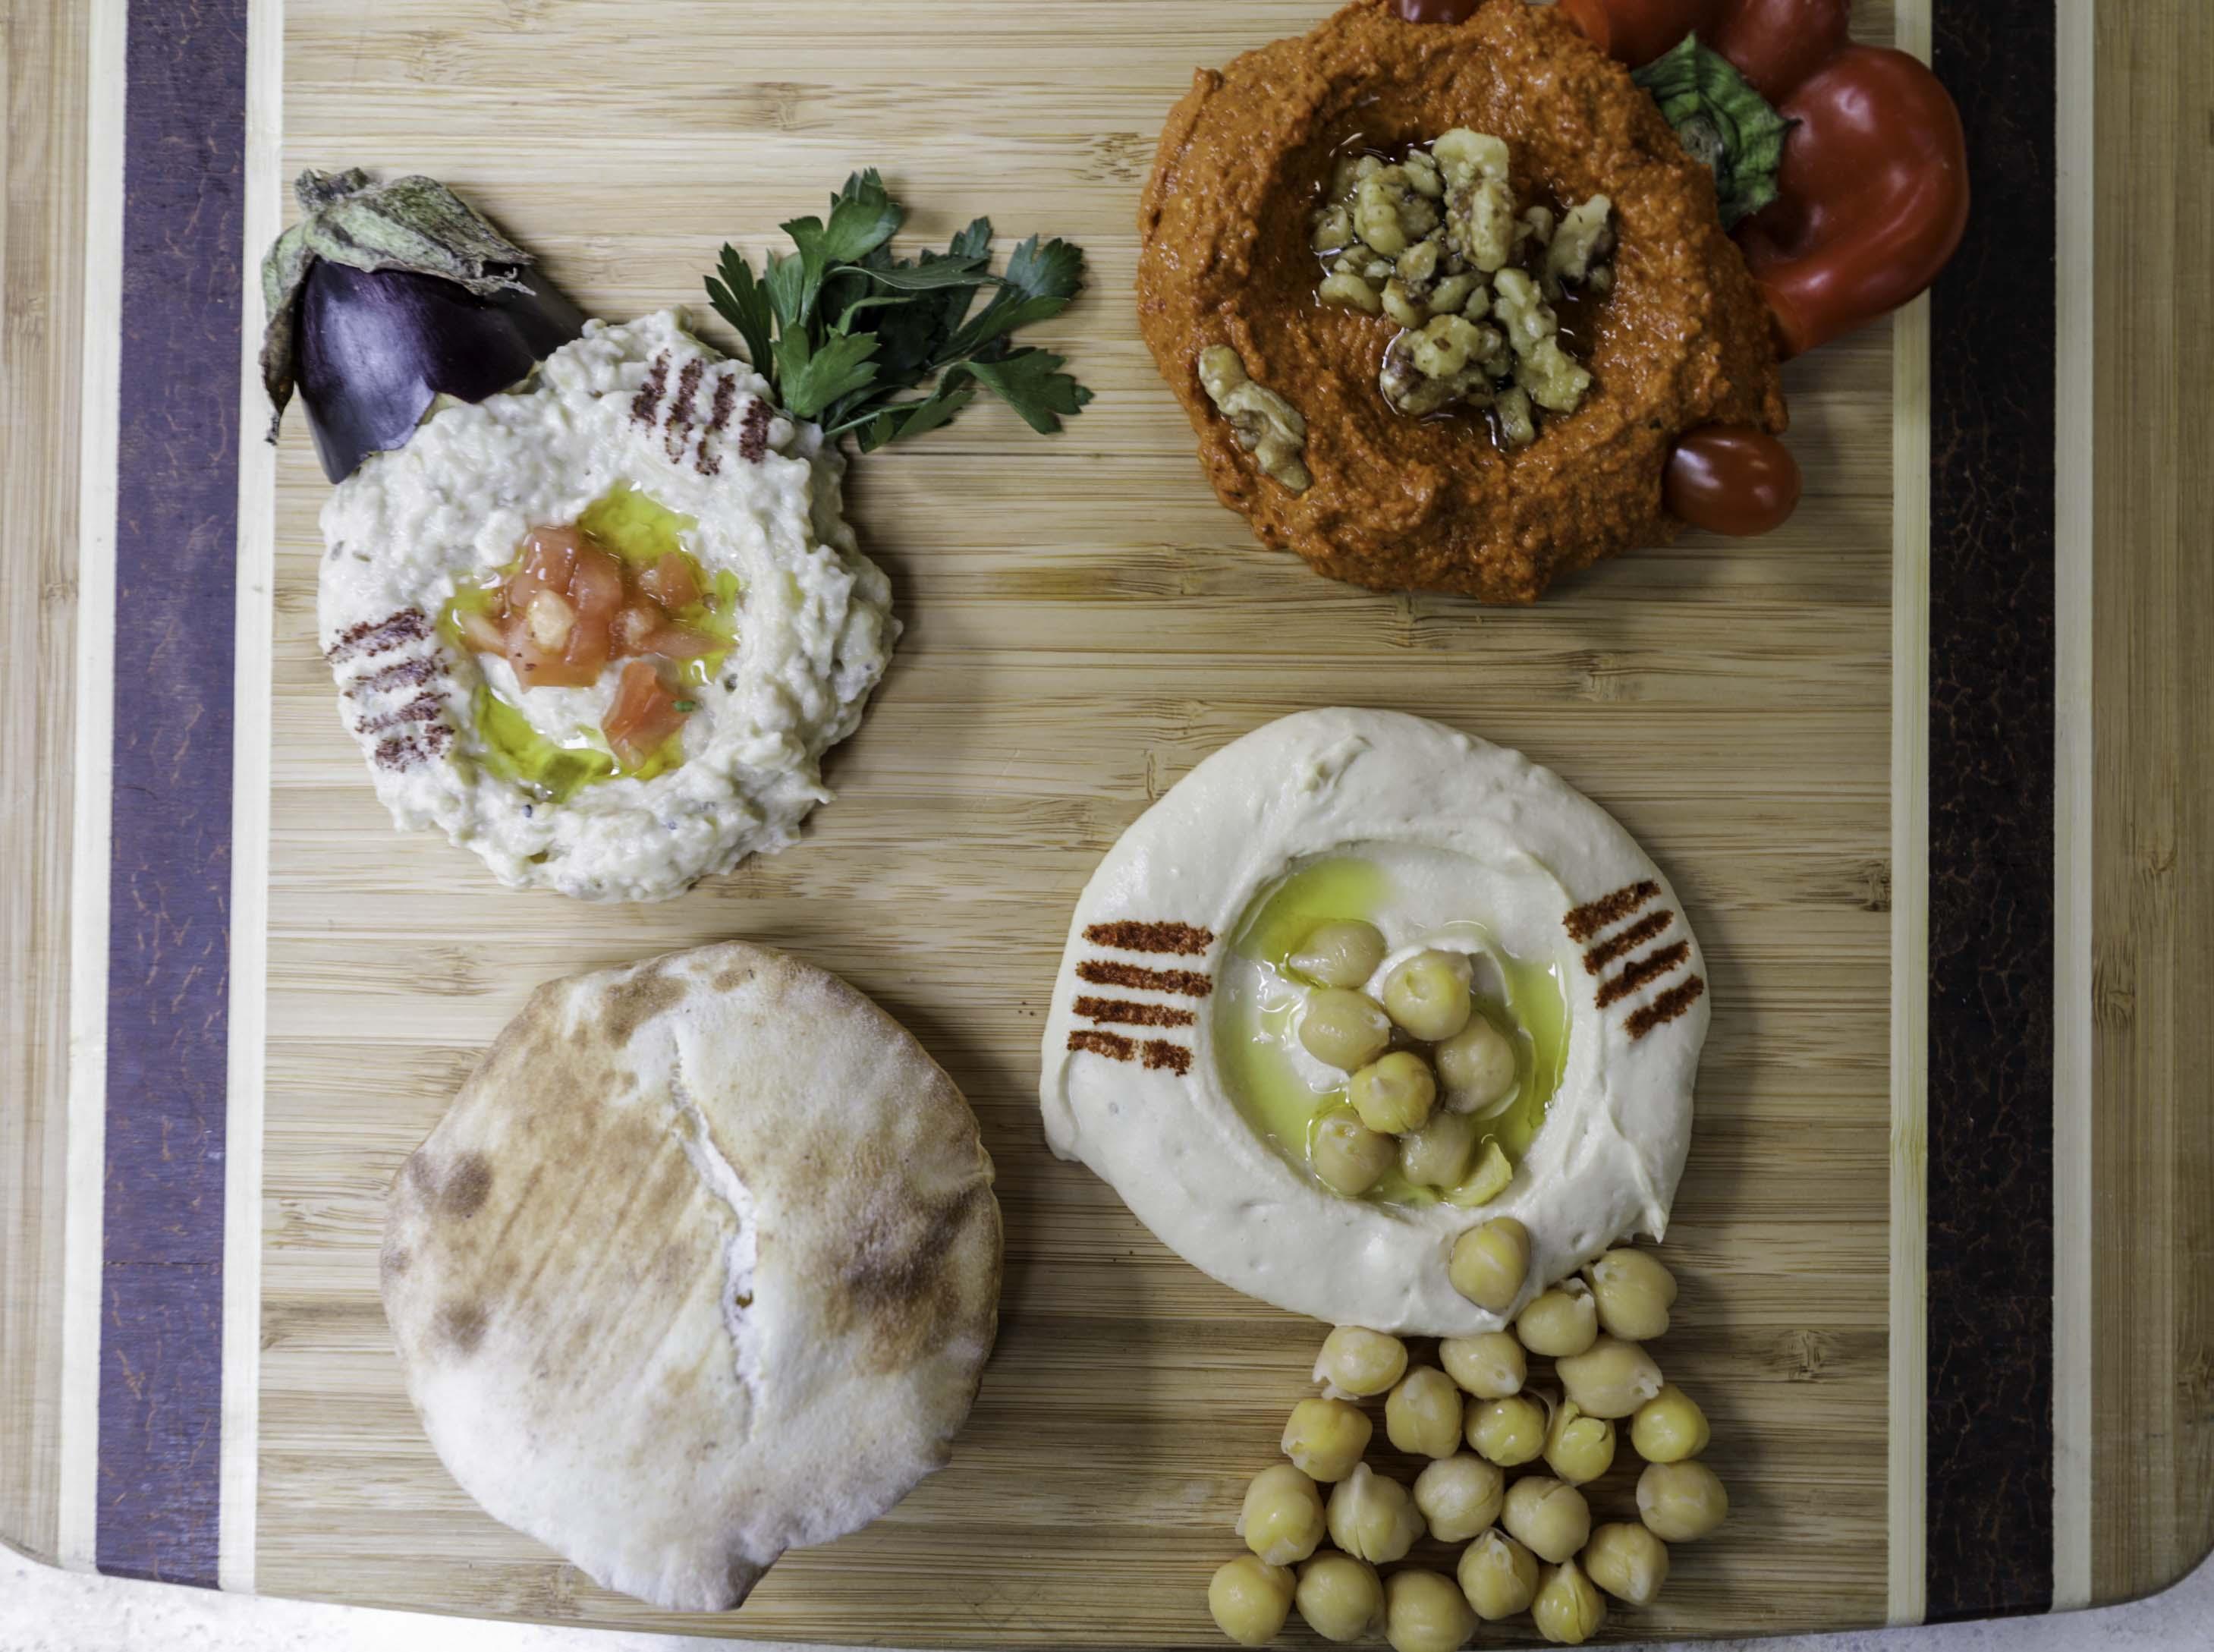 Dip Sampler, with Mhammara, Baba Ghanouj, Hummus (Lebanese Food)